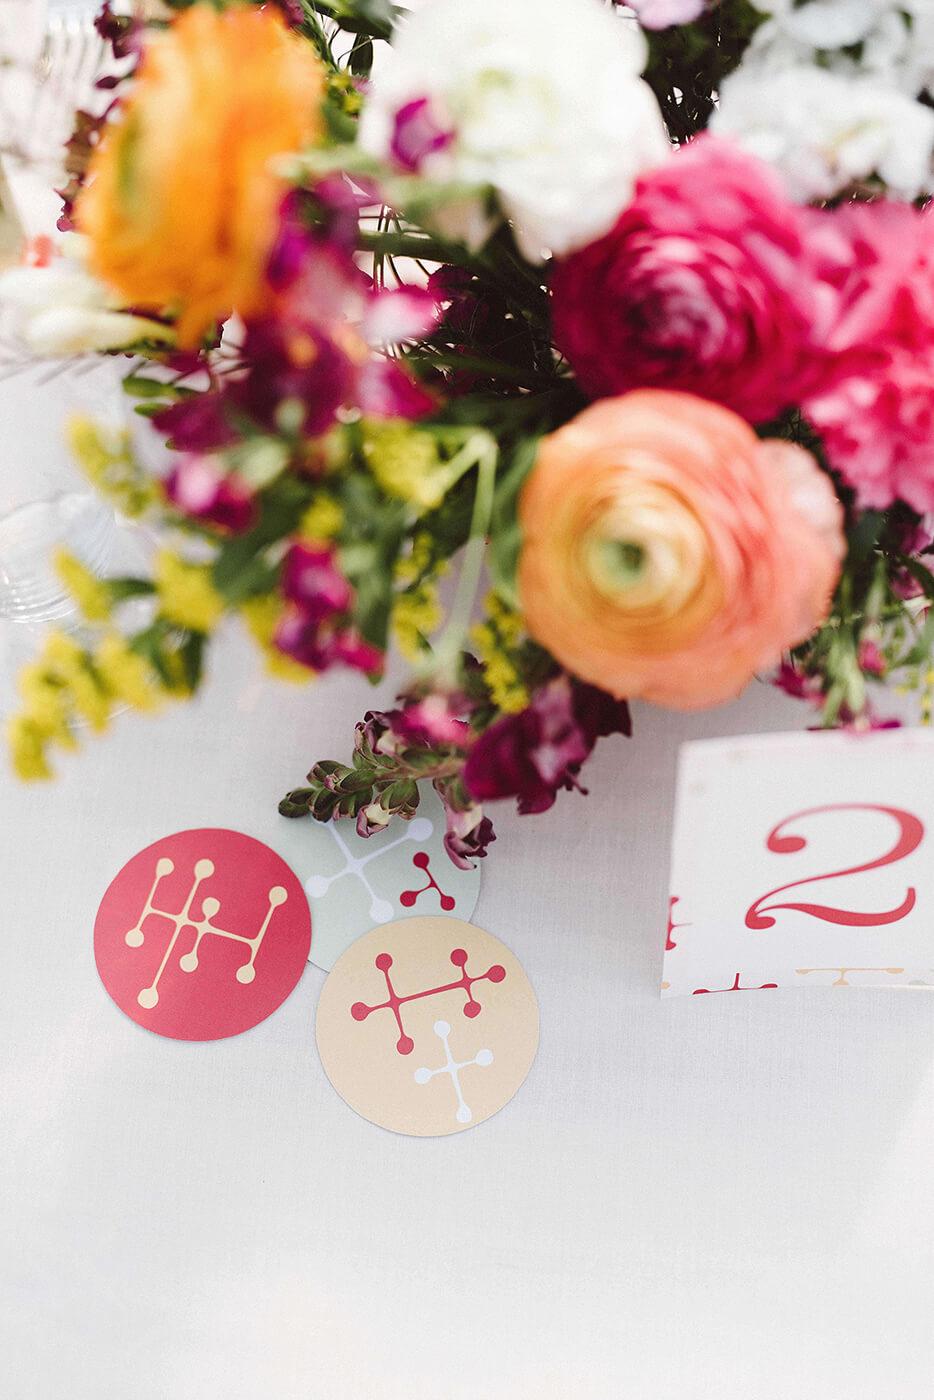 roma-organizacao-eventos-editorial-mid-century-modern-wedding-in-a-strawberry-field-20